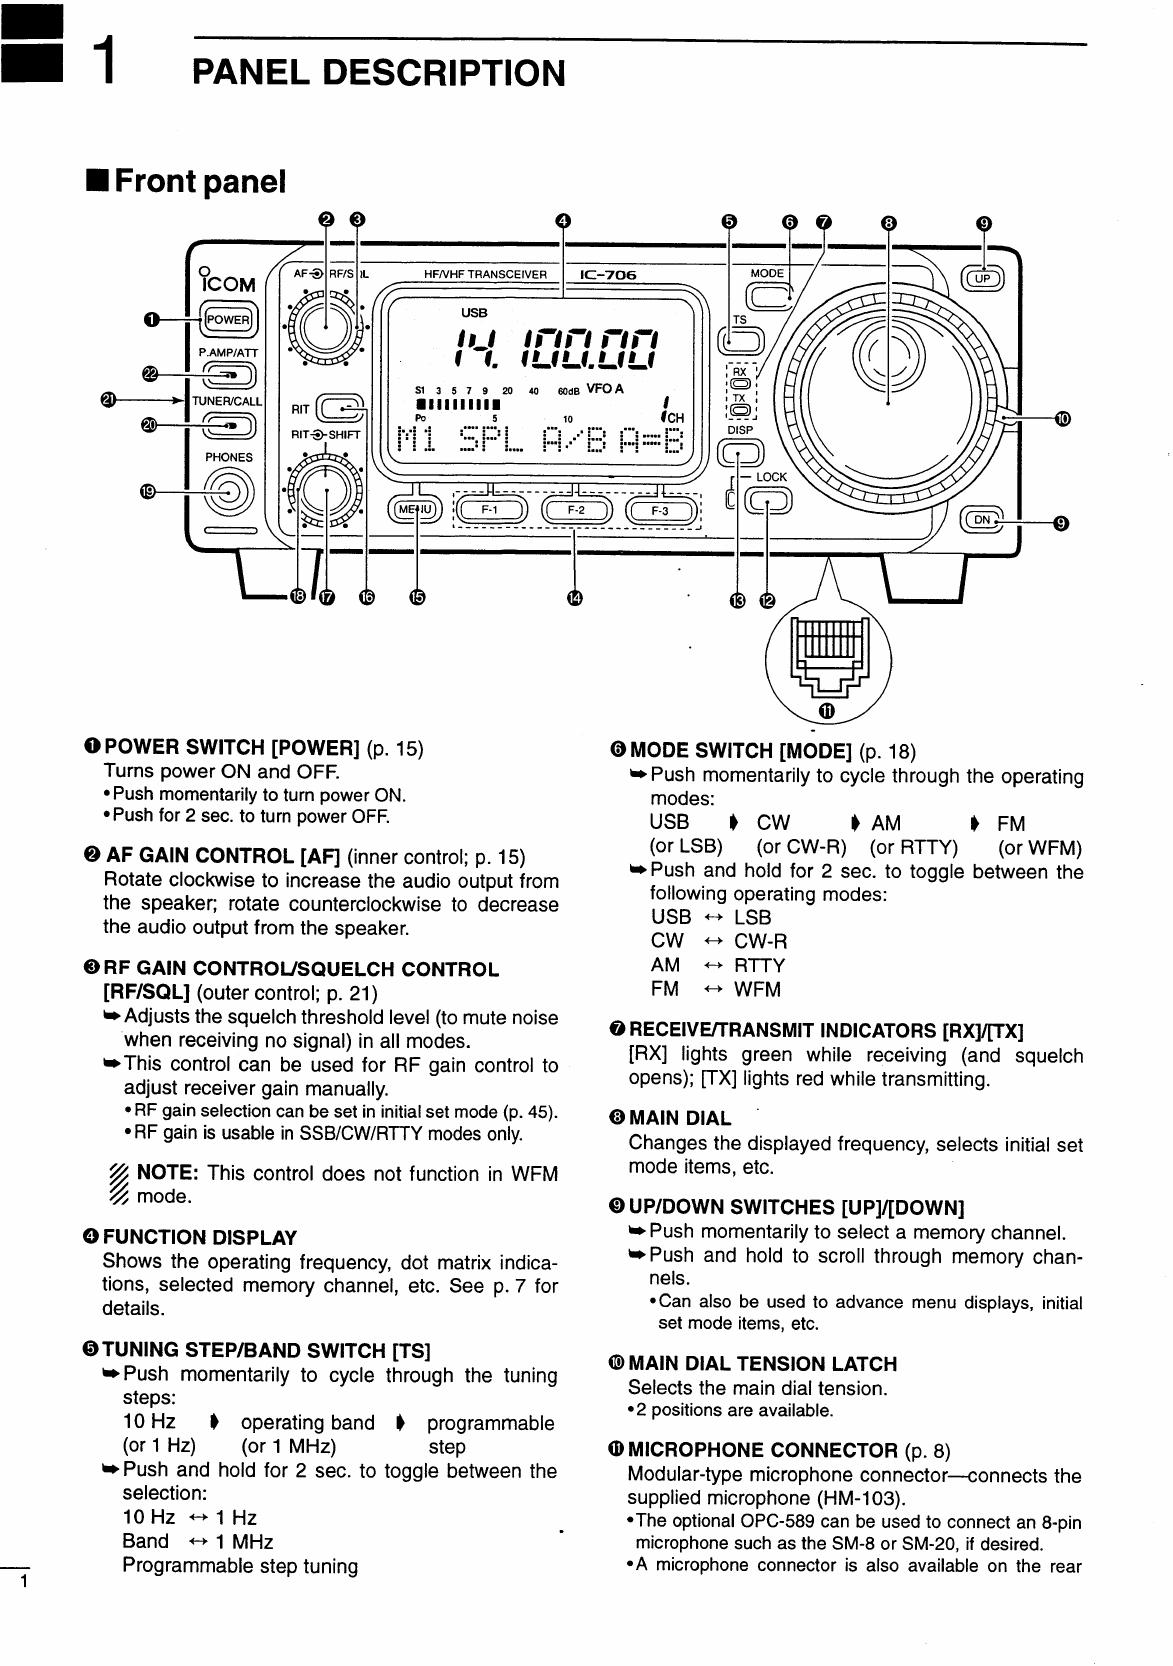 manual icom ic 706 page 58 of 60 english rh libble eu icom ic-706 instruction manual icom ic-706 mk2 service manual